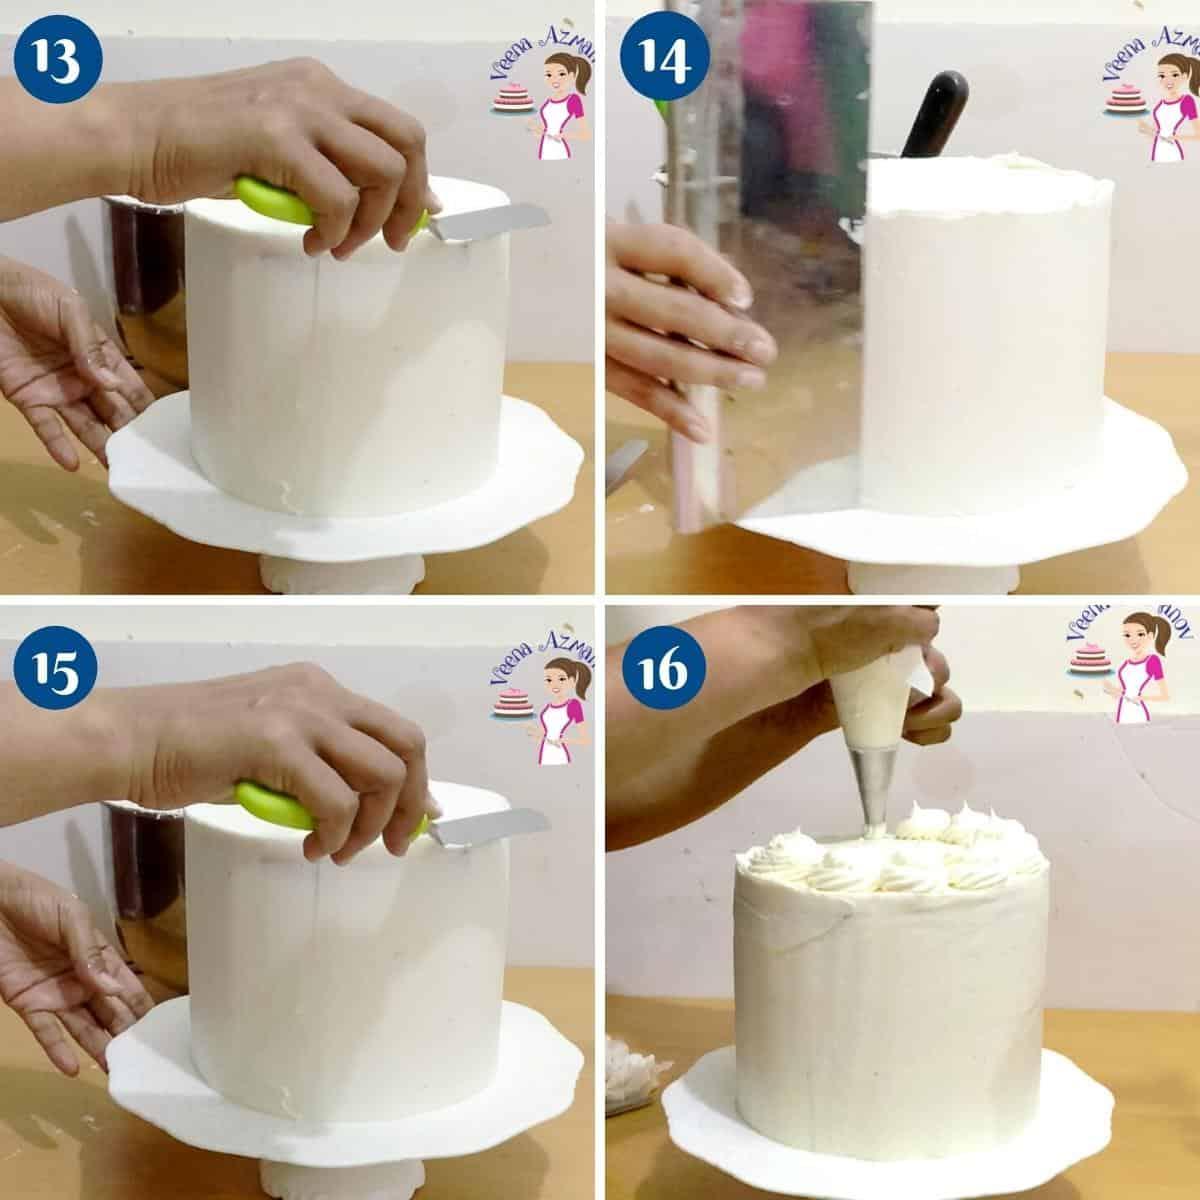 Progress pictures collage decorating birthday cake.